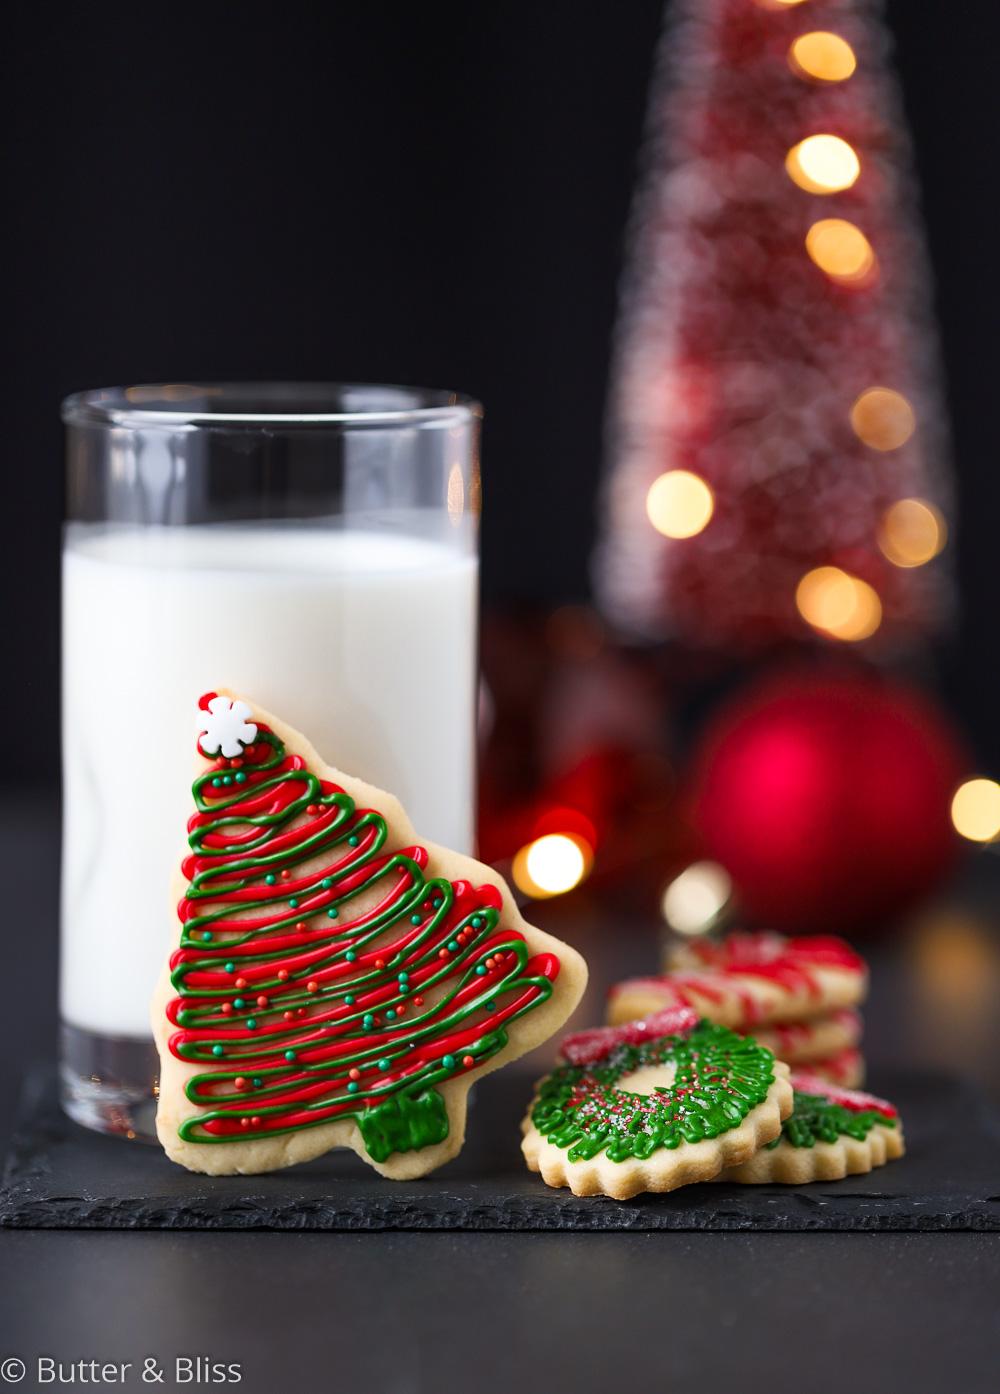 Festive cookies for Santa